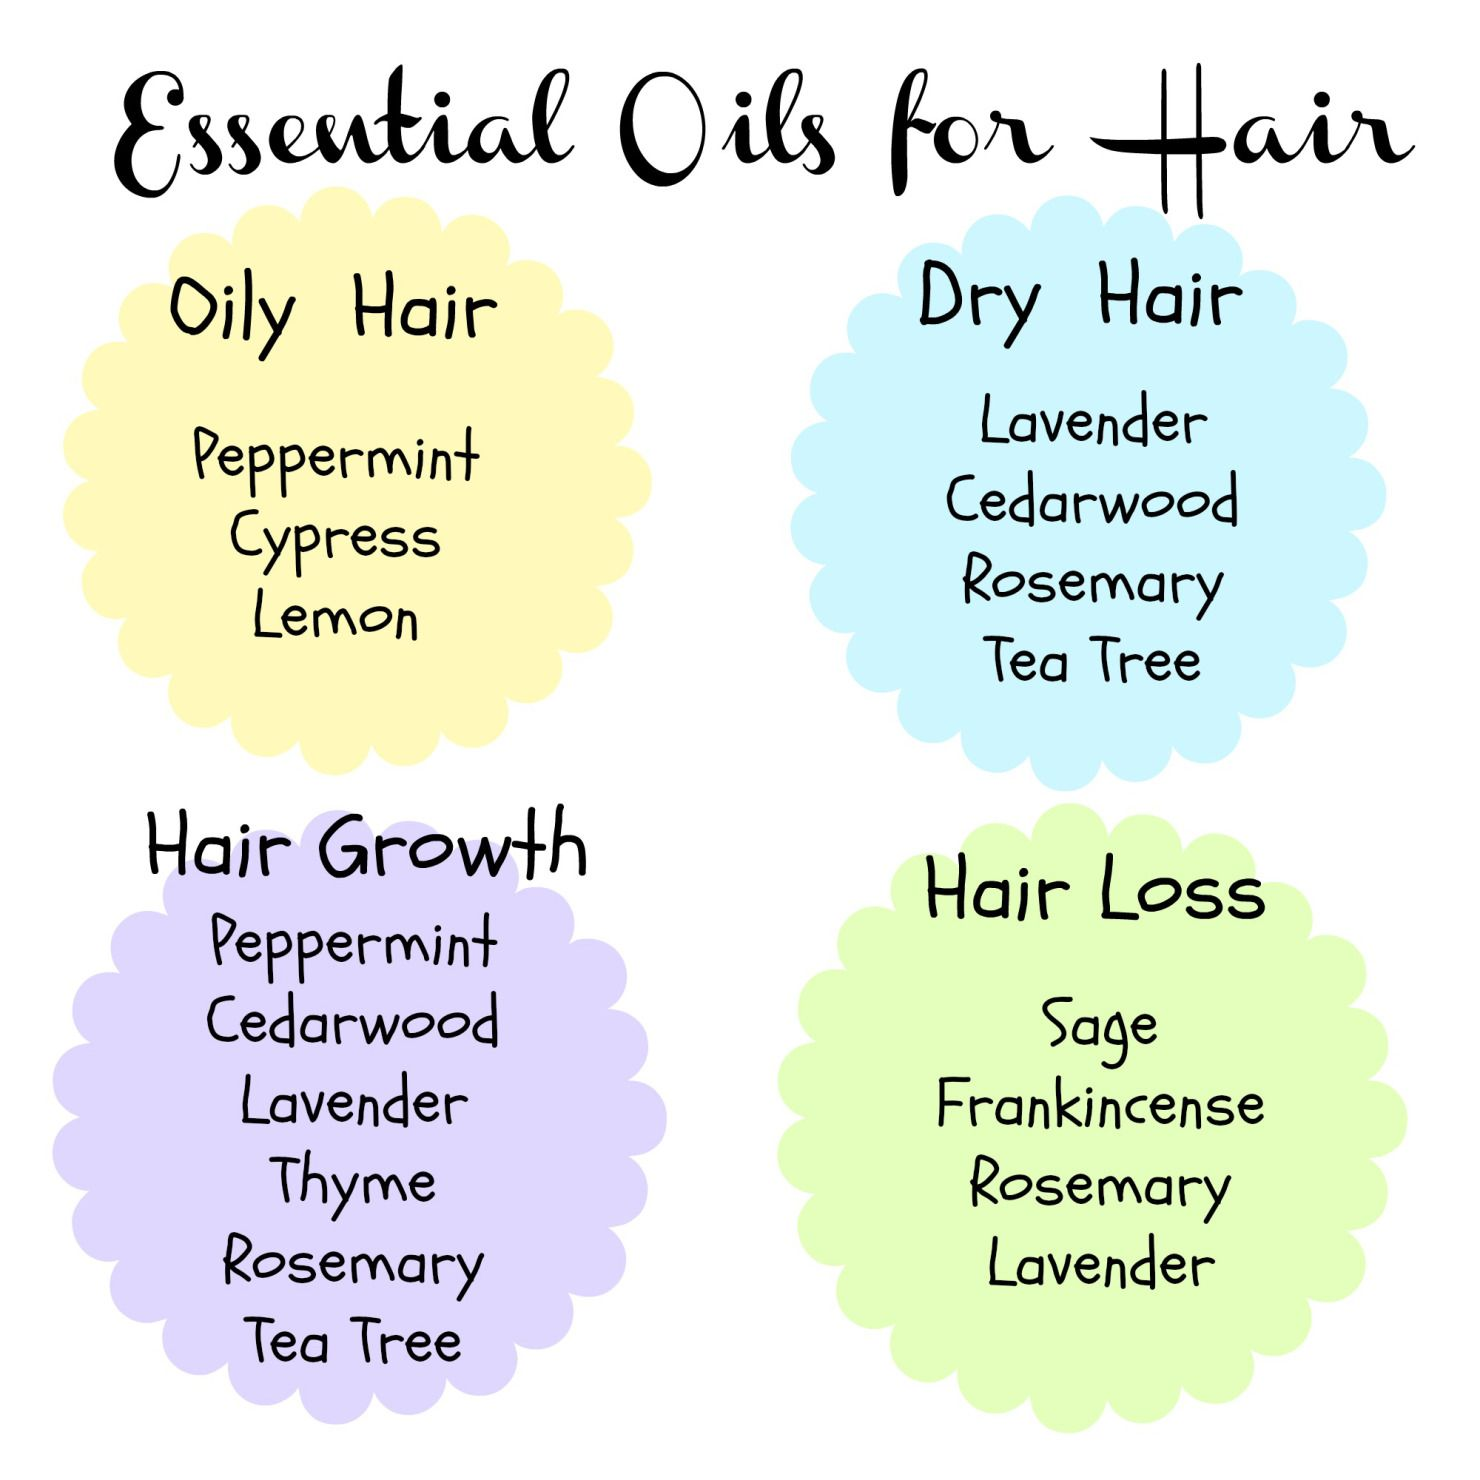 essential oils for hair skin haircare pinterest shampoo selber machen minimalismus und. Black Bedroom Furniture Sets. Home Design Ideas